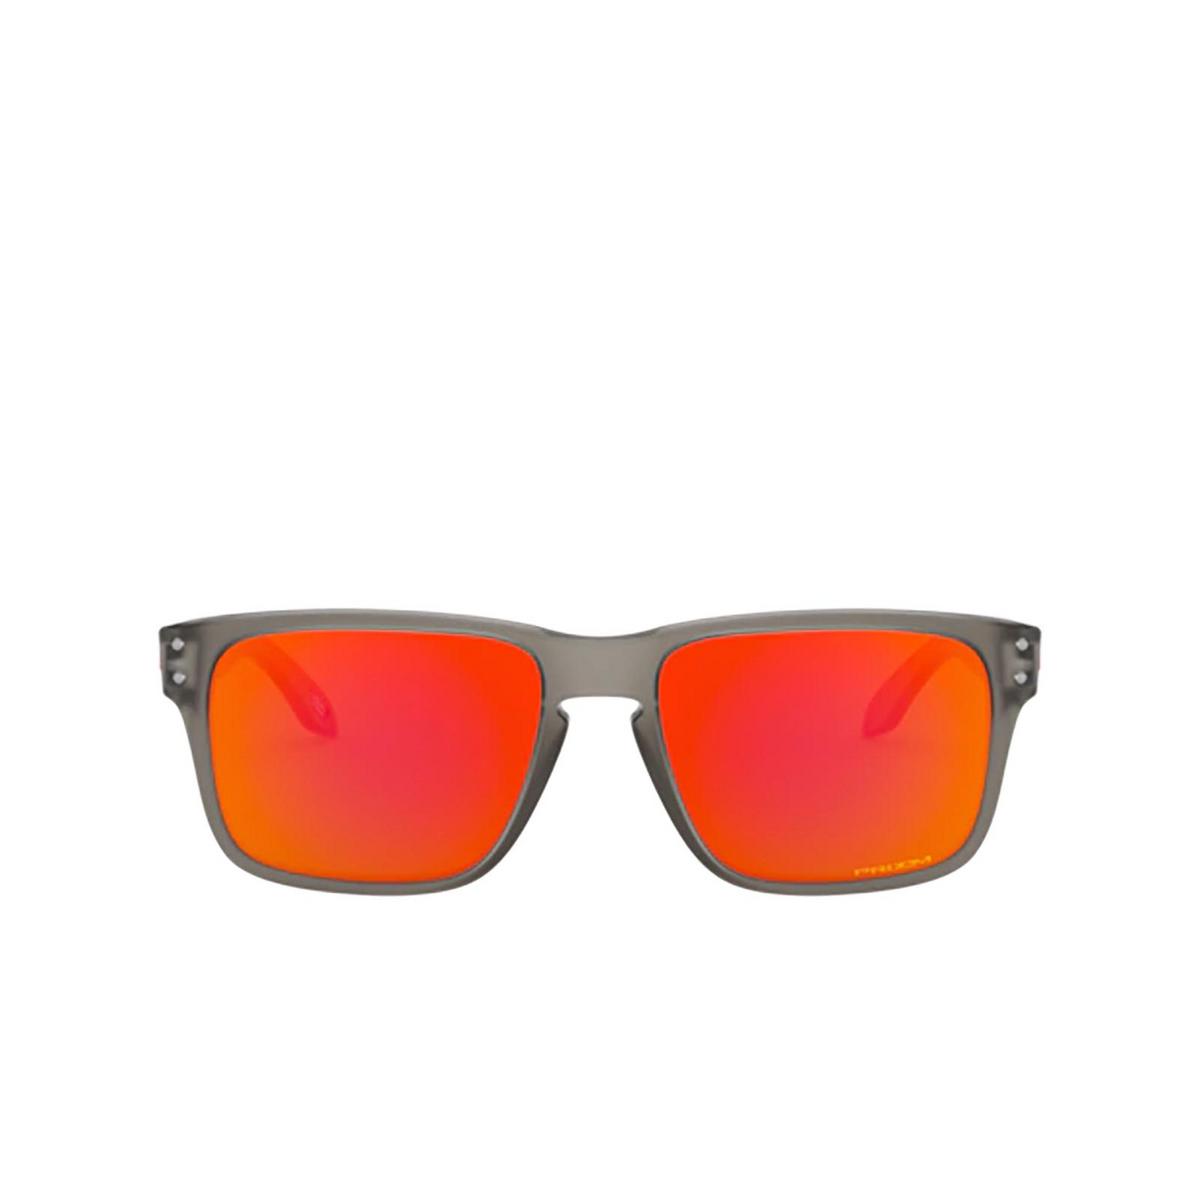 Oakley® Square Sunglasses: Holbrook Xs OJ9007 color Matte Grey Ink 900703 - front view.